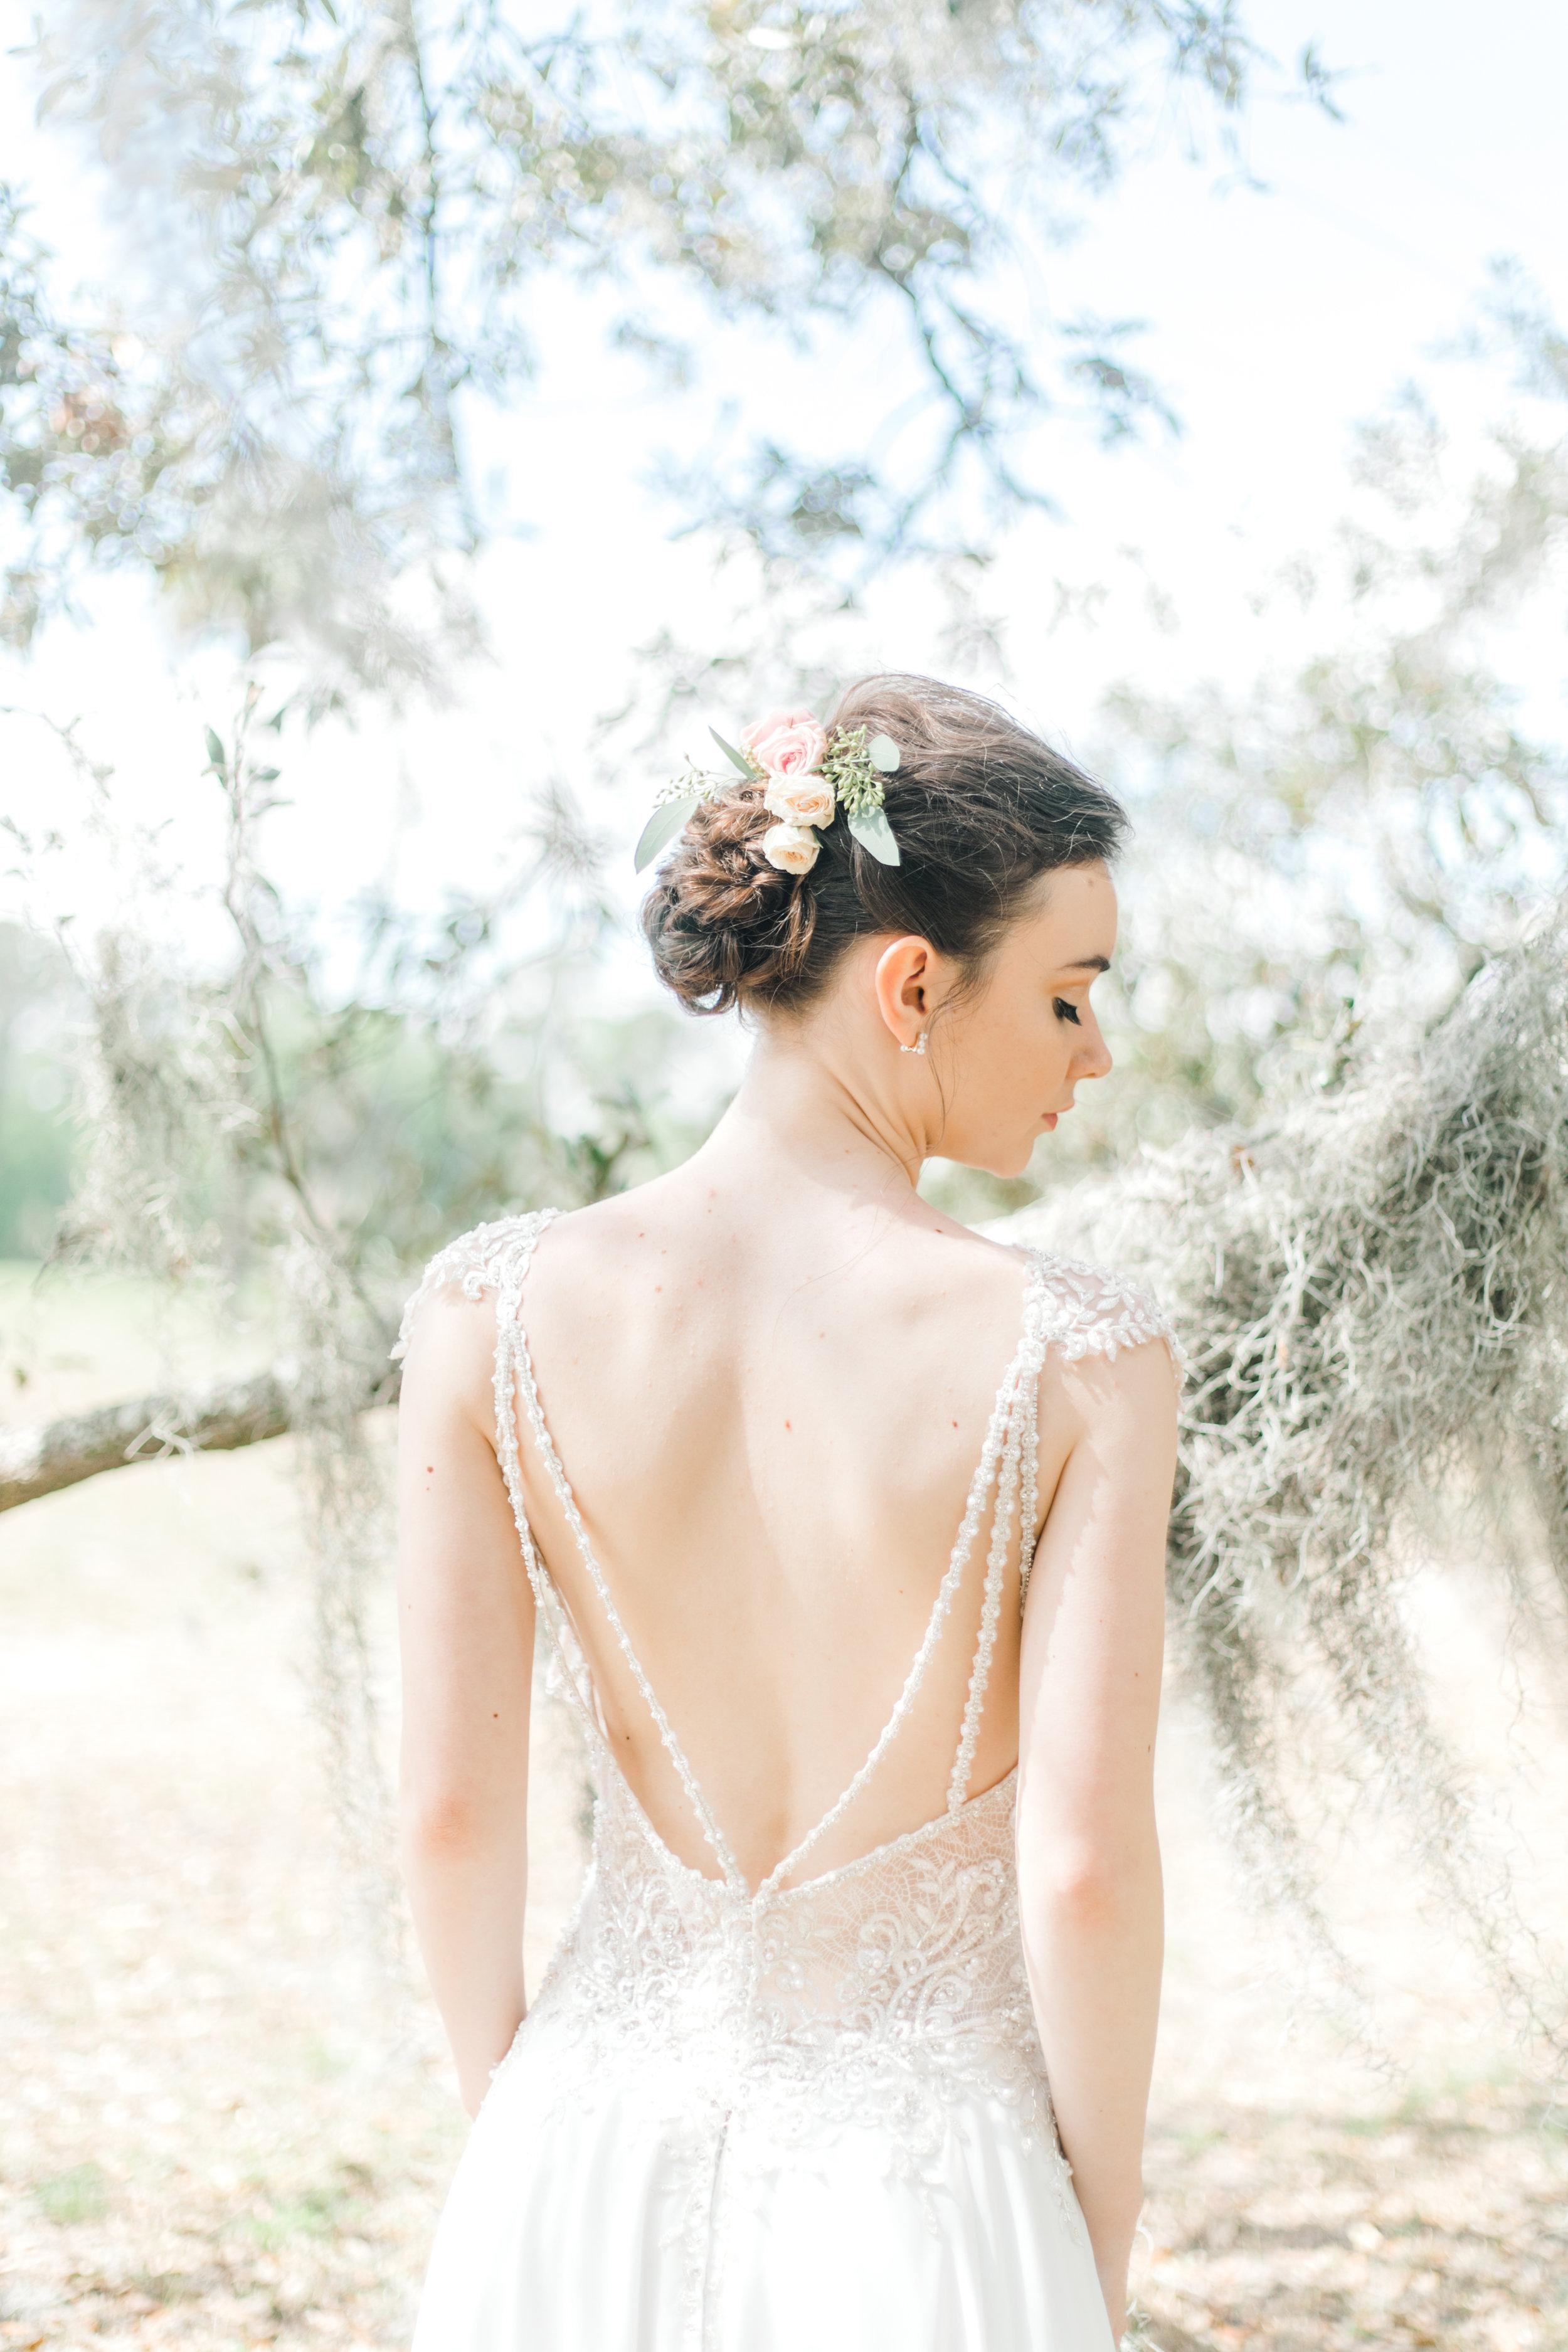 maggie-sottero-gabor-wedding-dress-ivory-and-beau-savannah-wedding-dresses-wormsloe-wedding-inspiration-wormsloe-elopement-glamorous-wedding-dress-savannah-bride-Selyciayangphotograpy-79.jpg